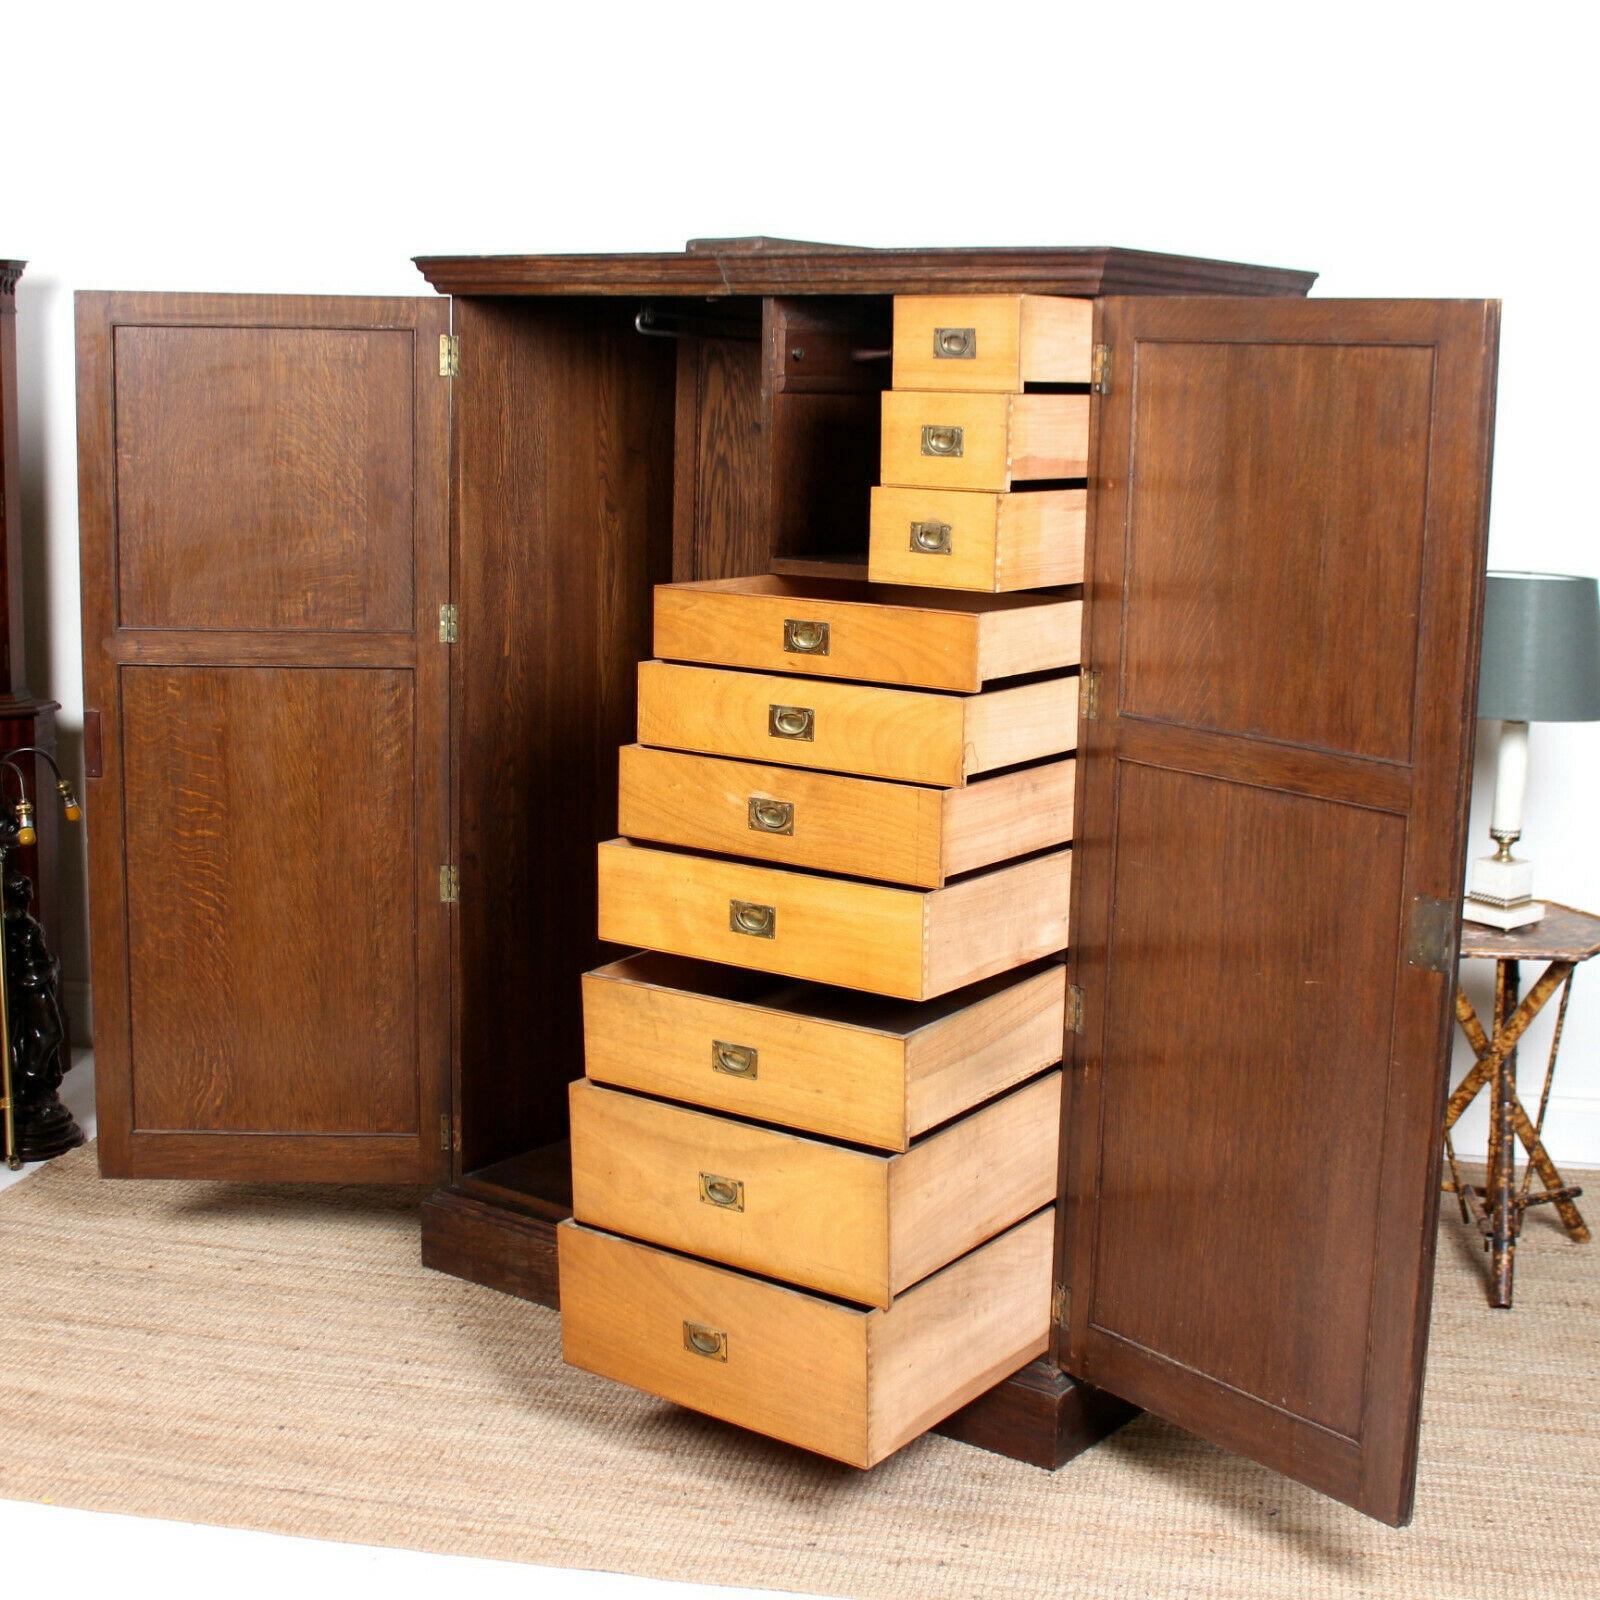 Antique Oak Wardrobe Compactum Armoire Edwardian Arts Crafts Unknown Vinterior